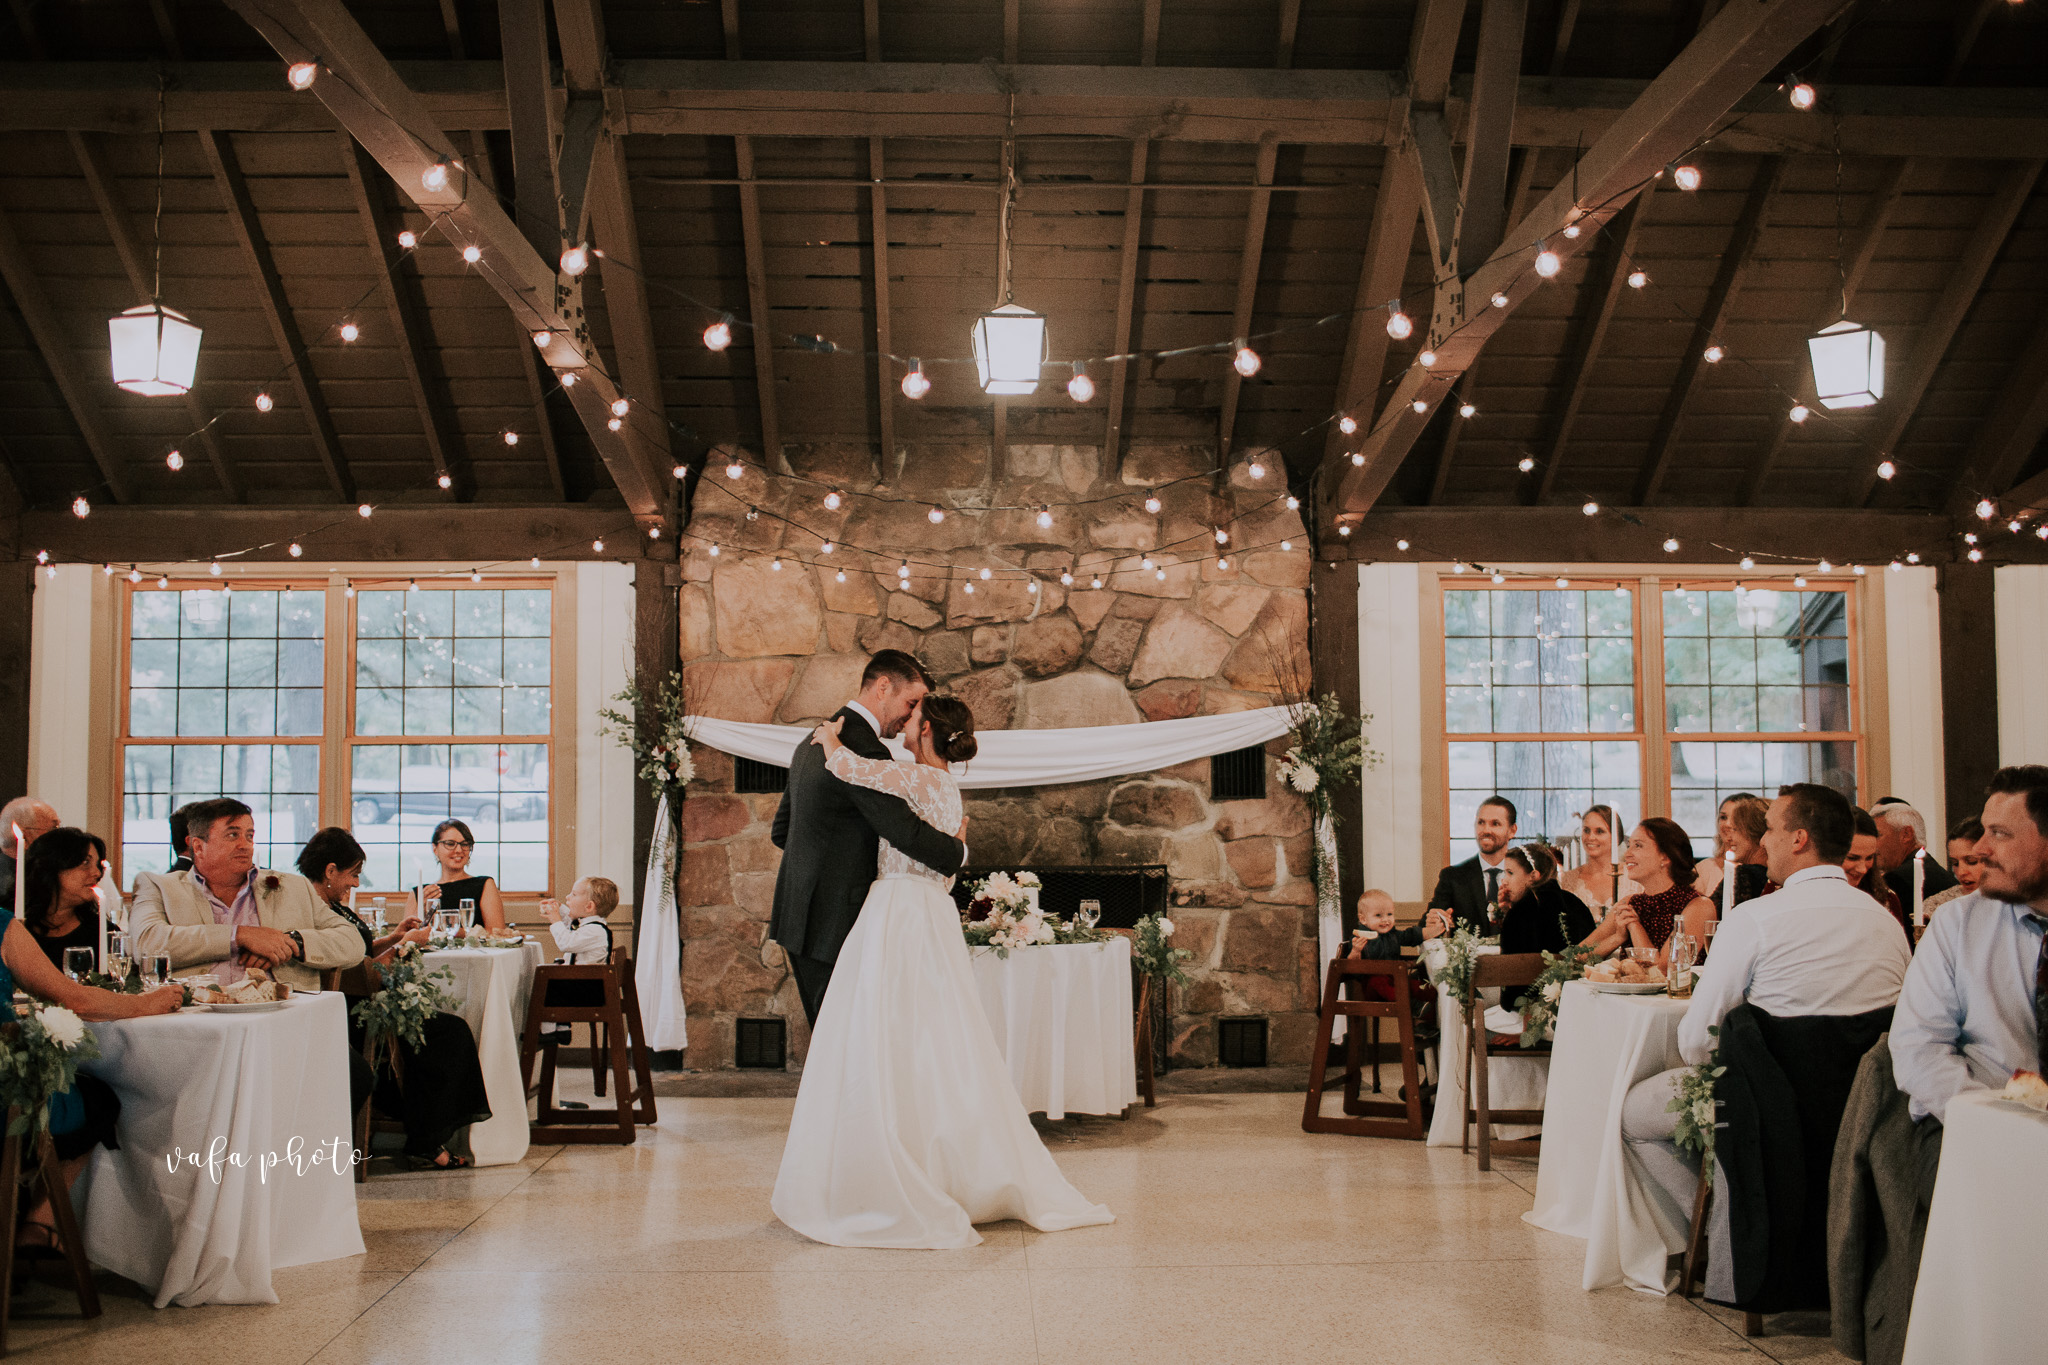 Grand-Rapids-Wedding-Danielle-Brian-Vafa-Photo-909.jpg